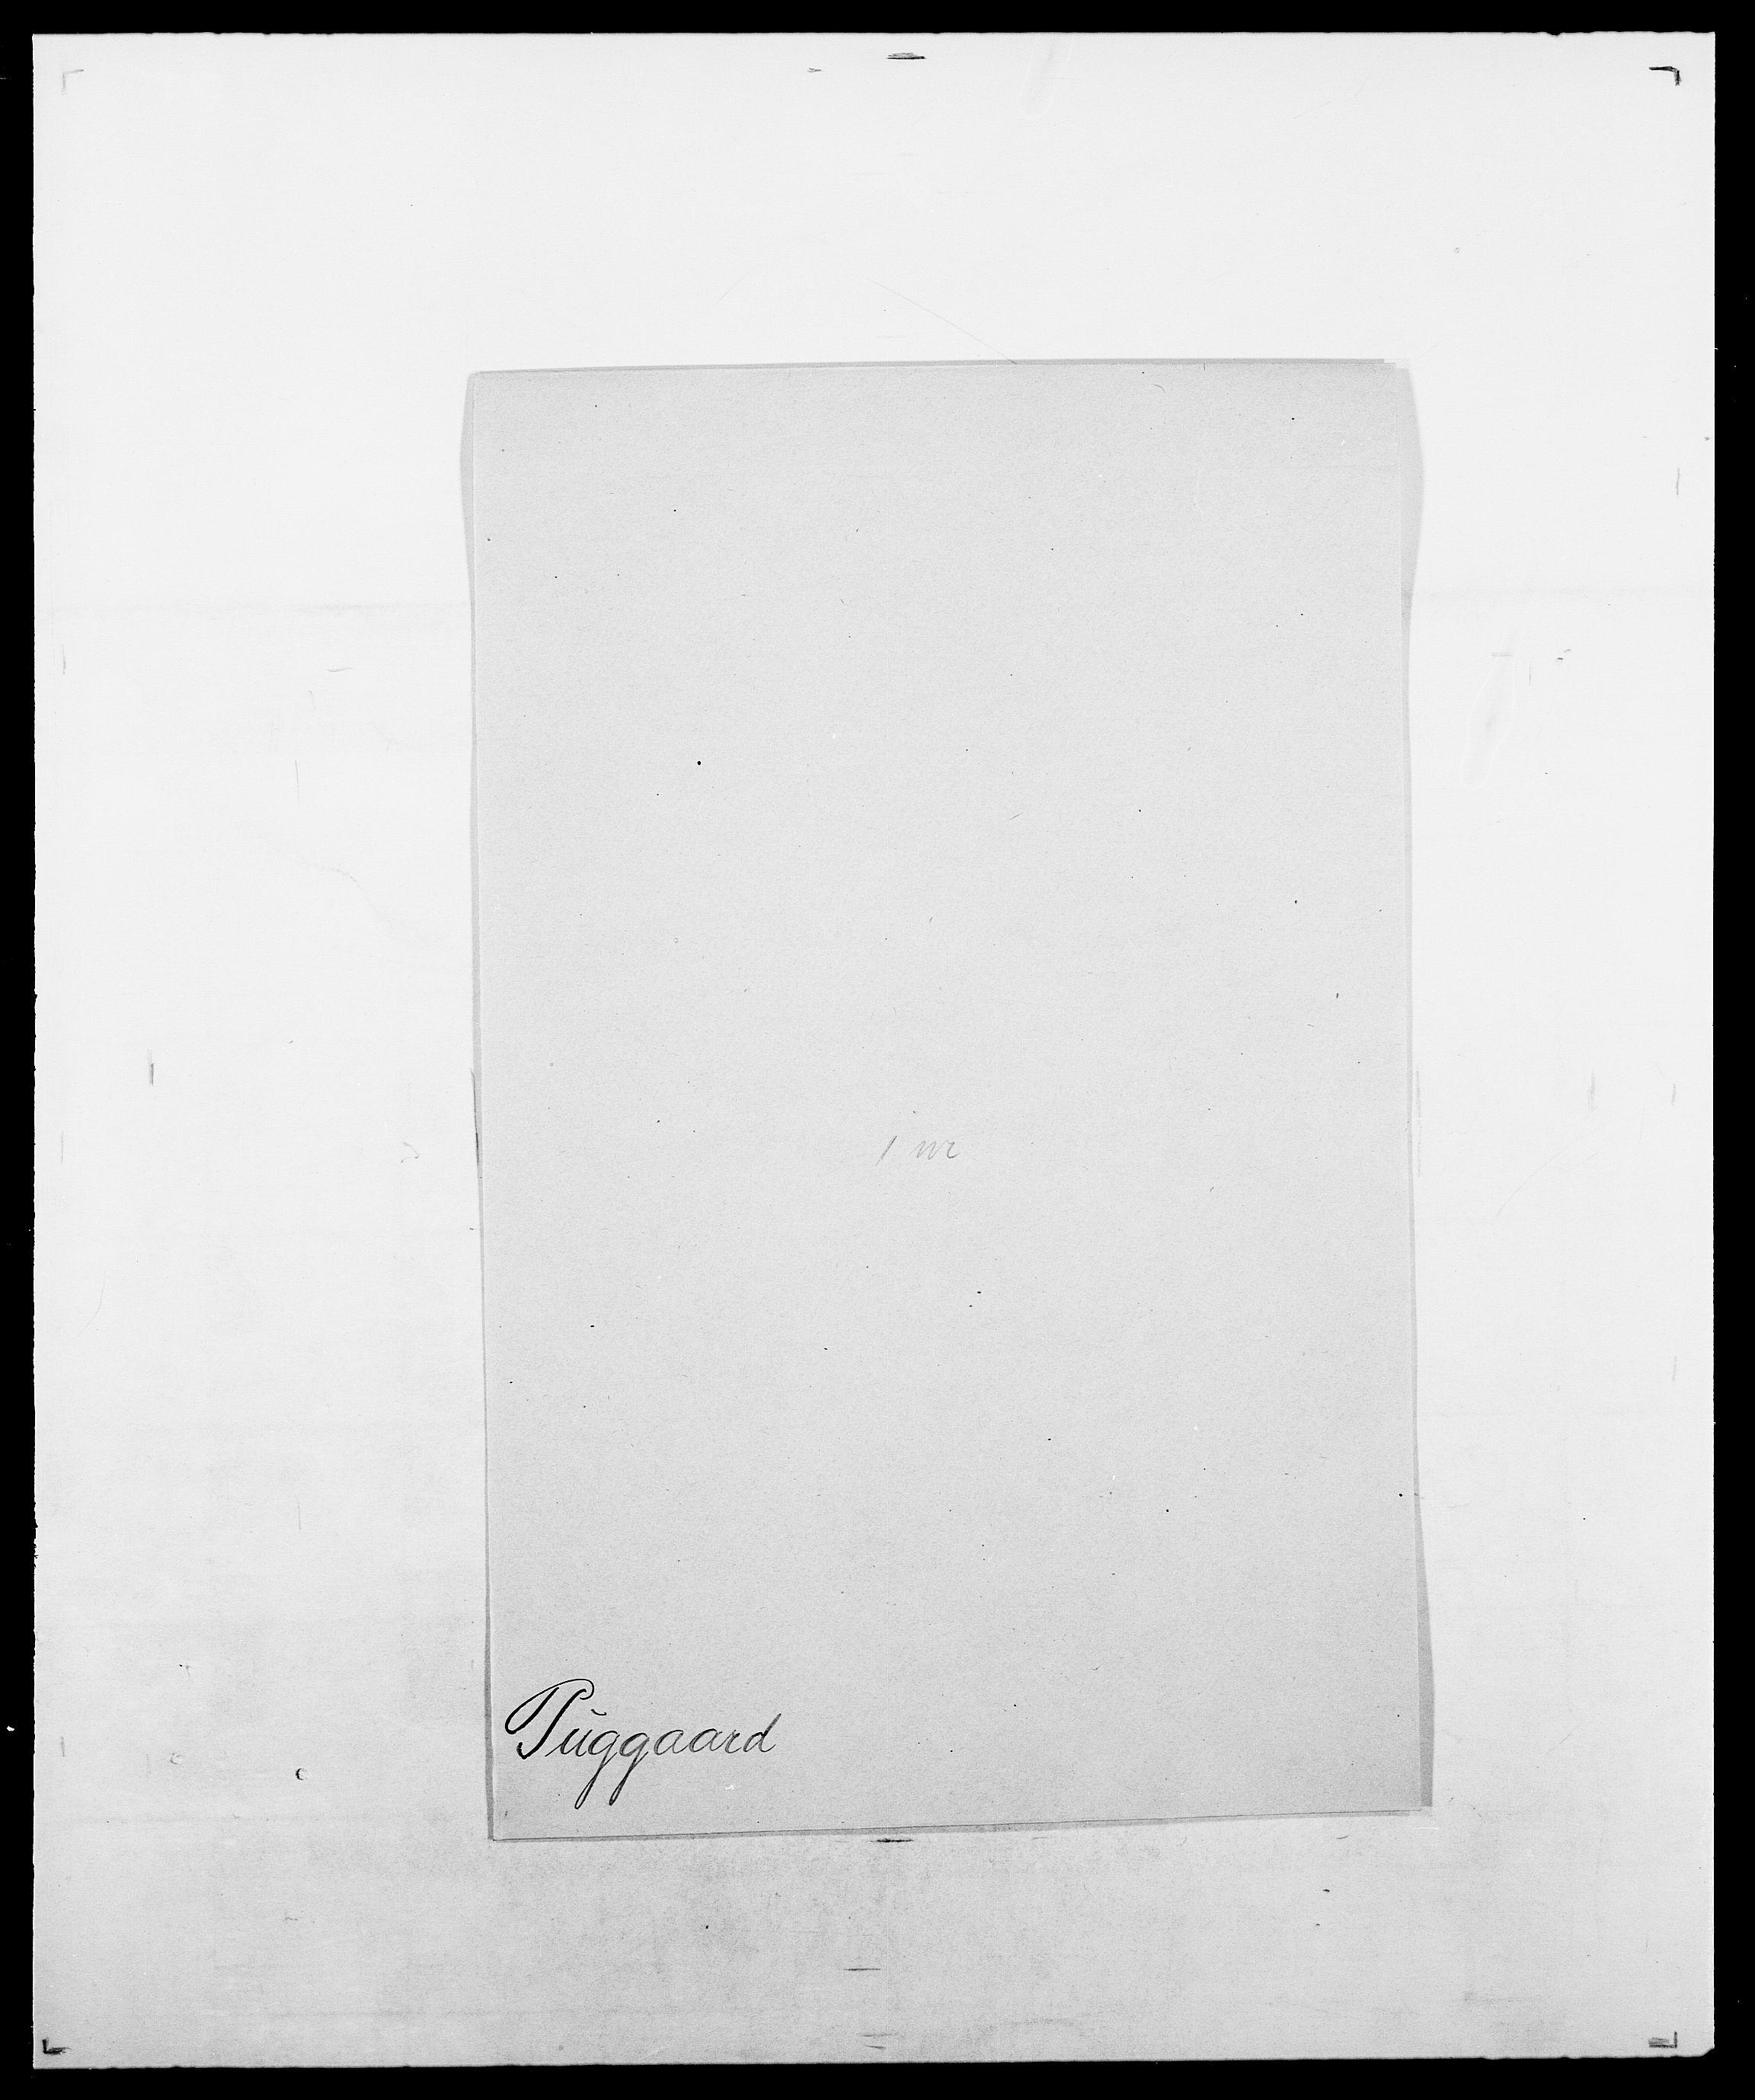 SAO, Delgobe, Charles Antoine - samling, D/Da/L0031: de Place - Raaum, s. 434